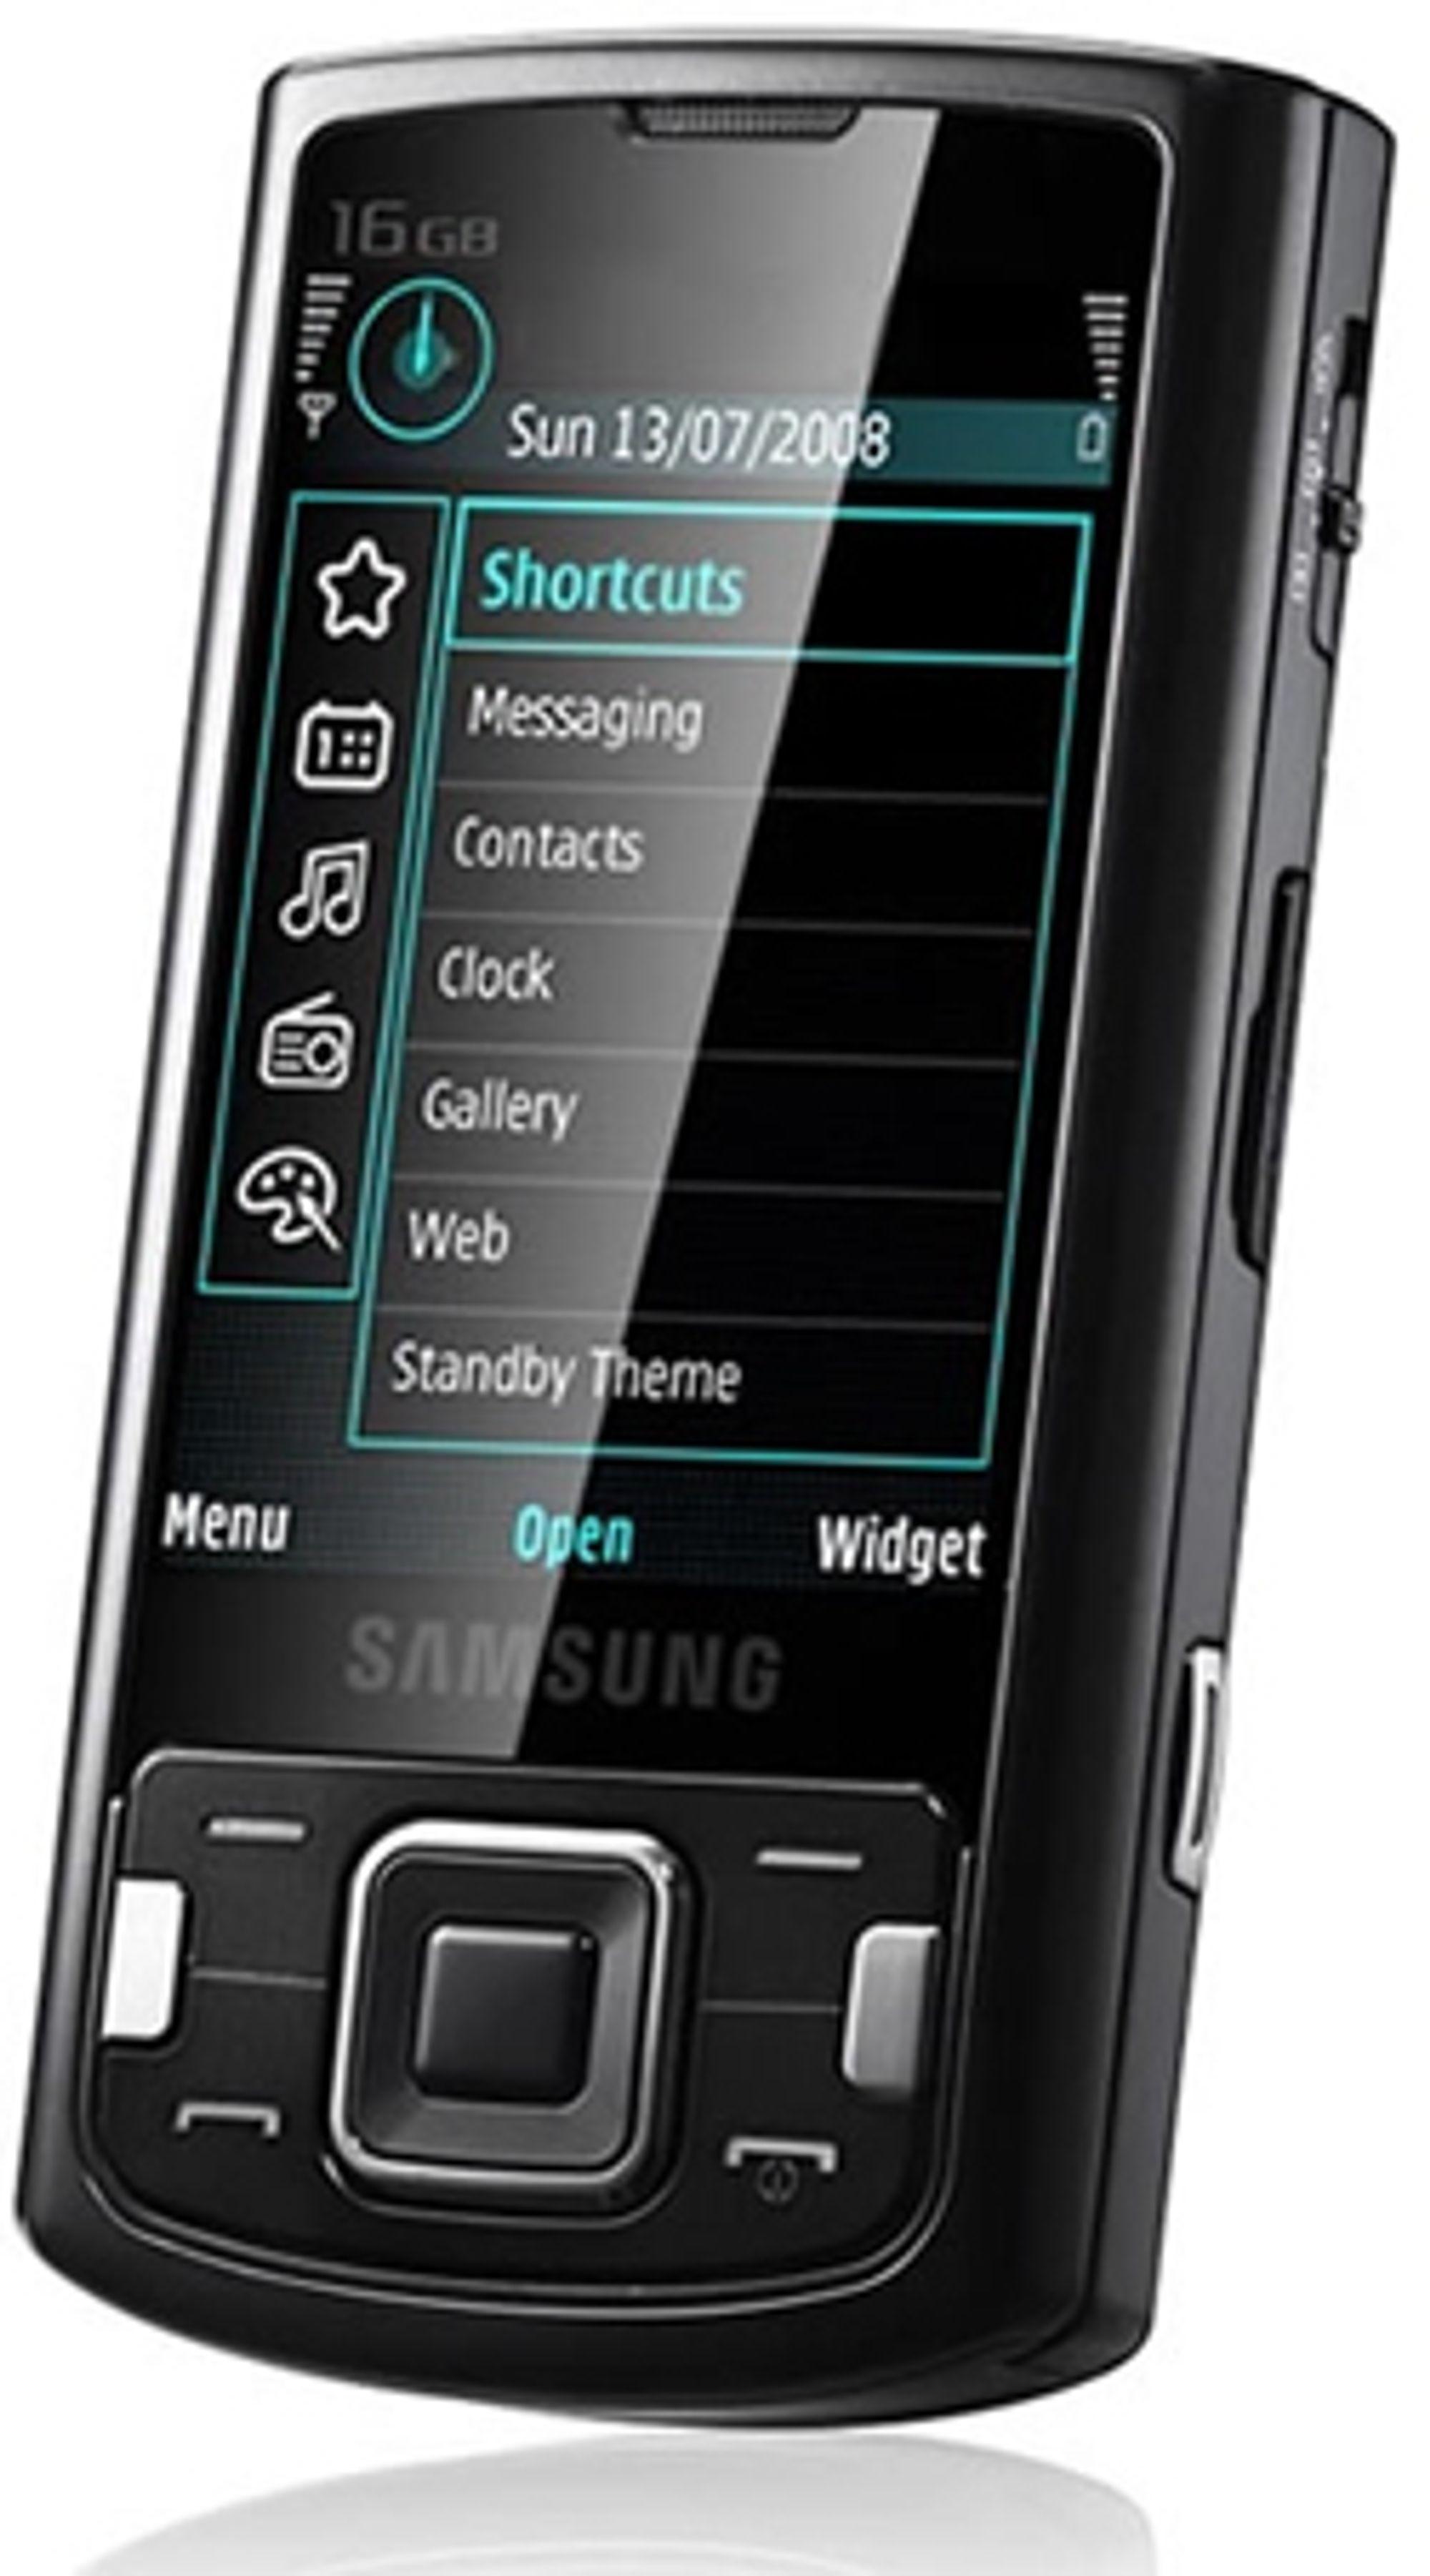 Telefoner som Samsung Innov8 kan bli dyrere.